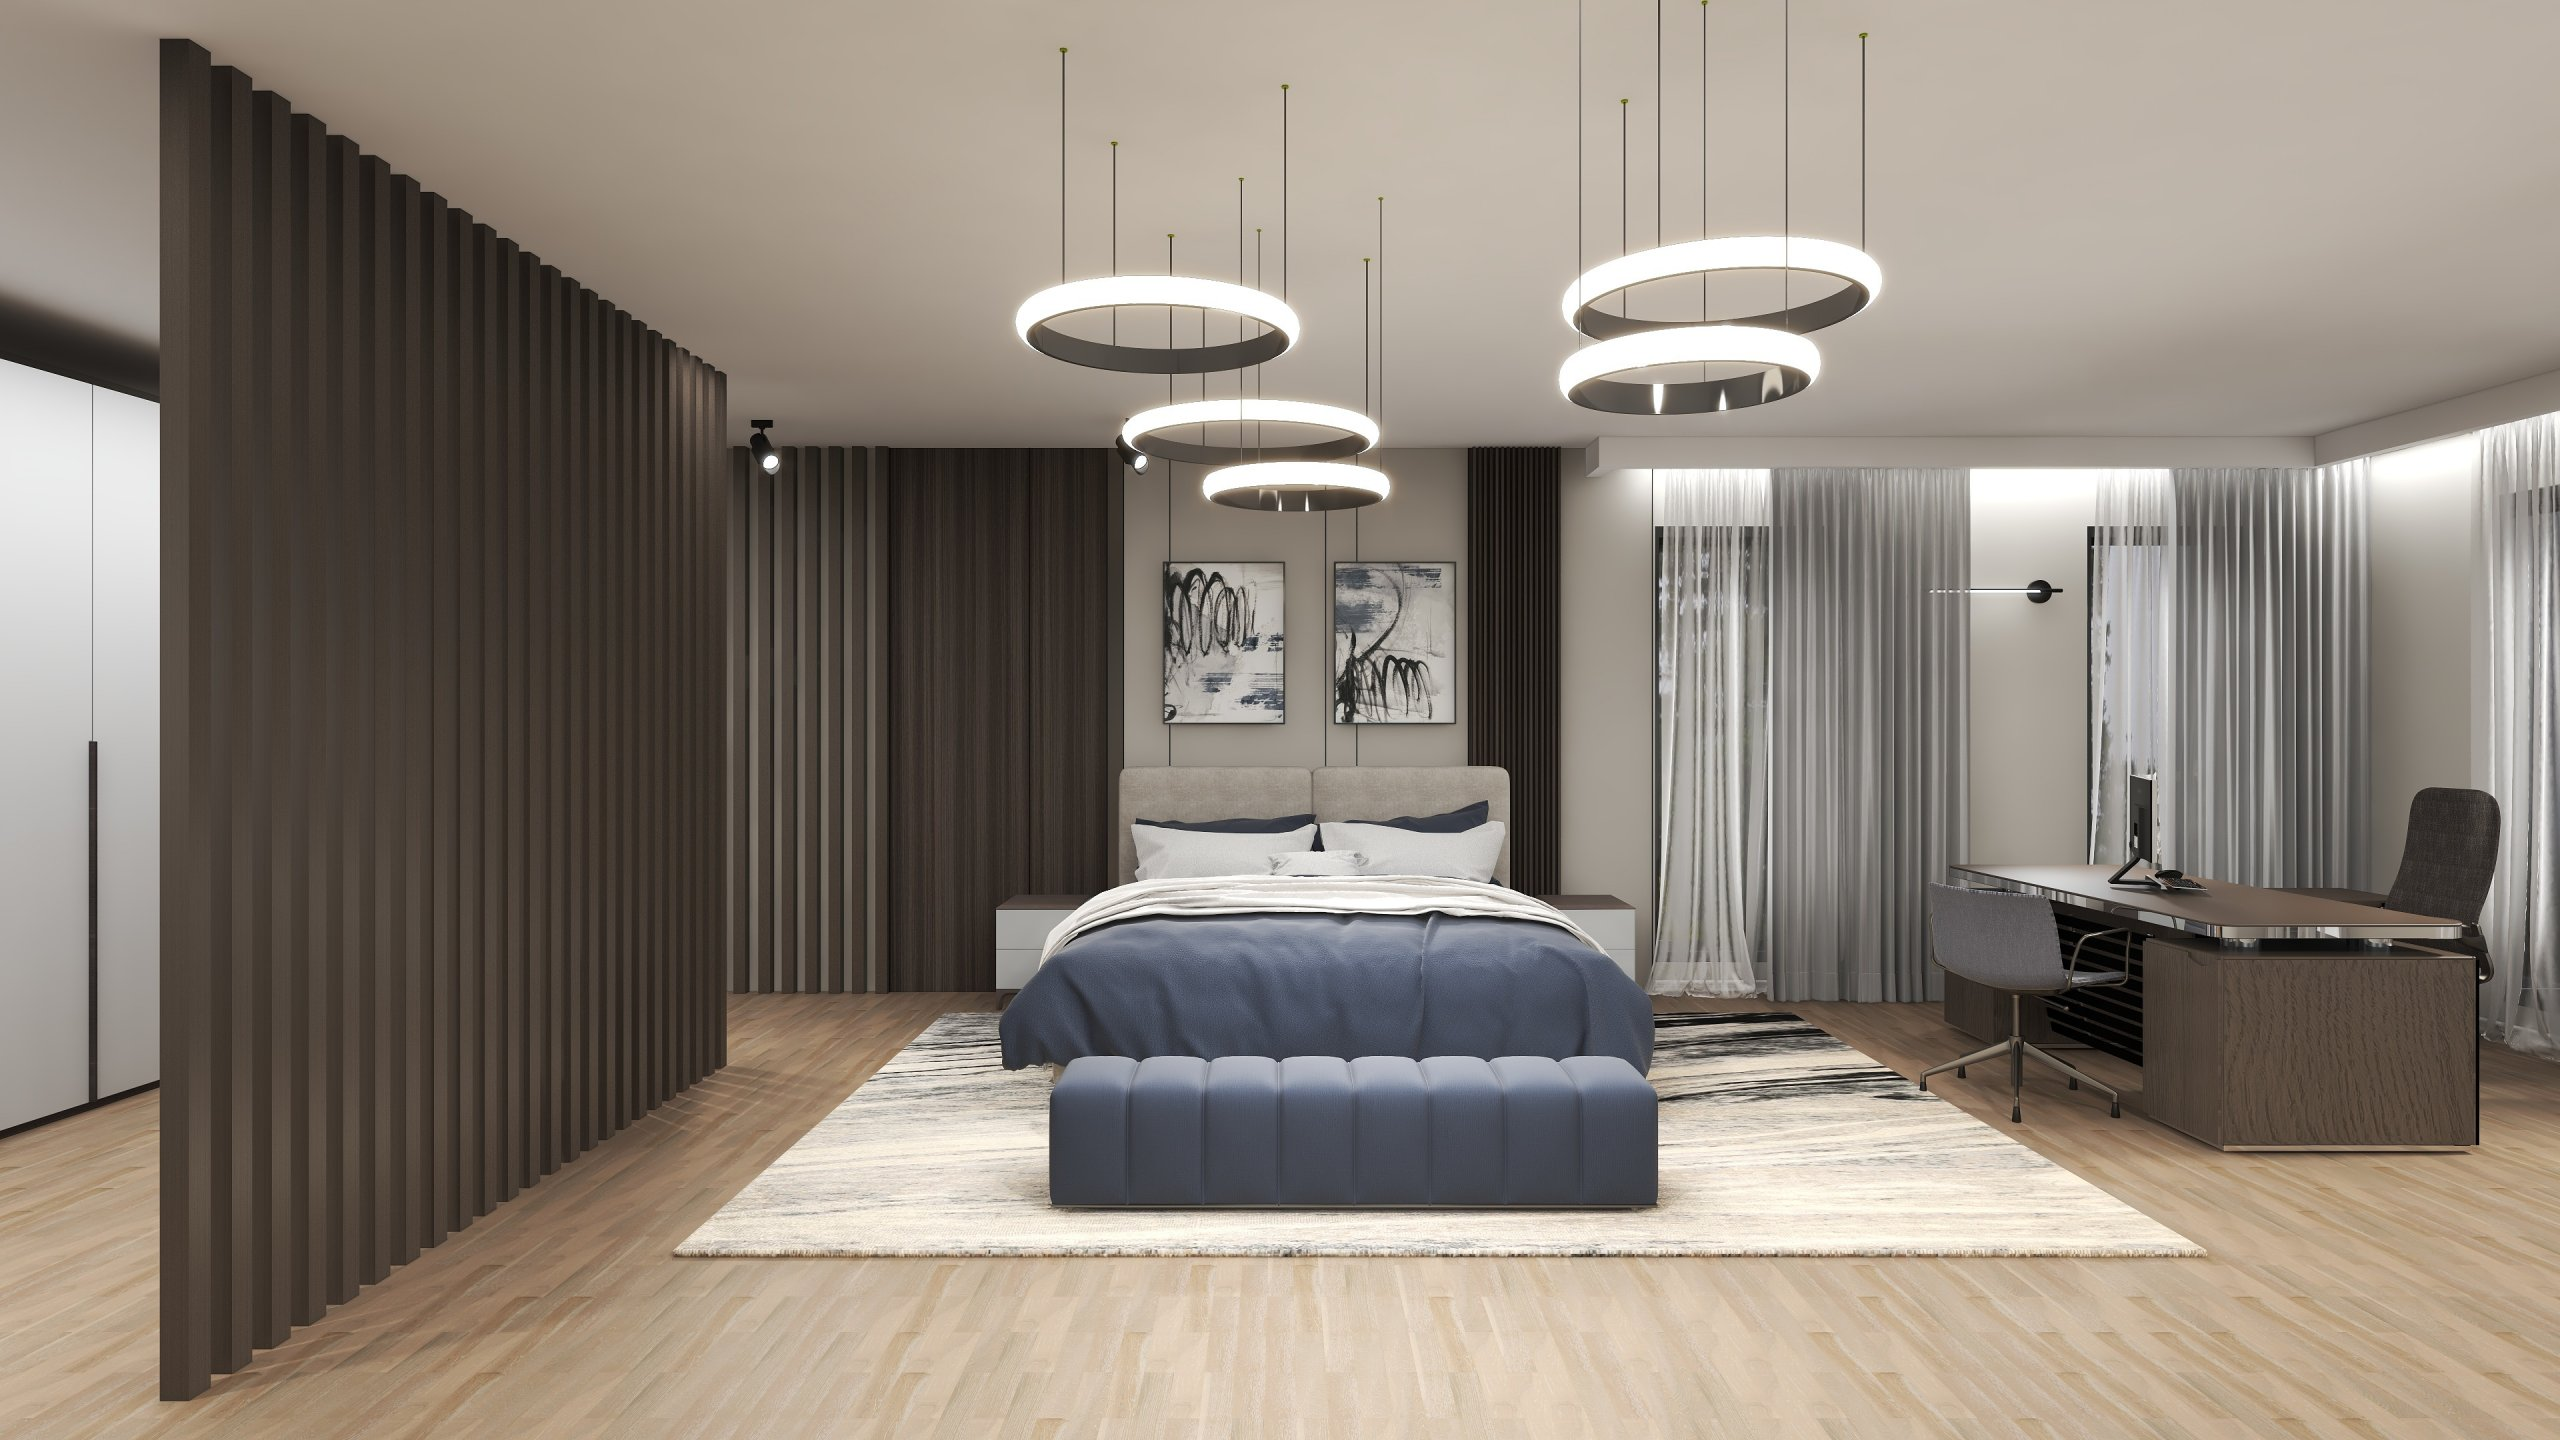 Dormitor etaj amenajat masculin